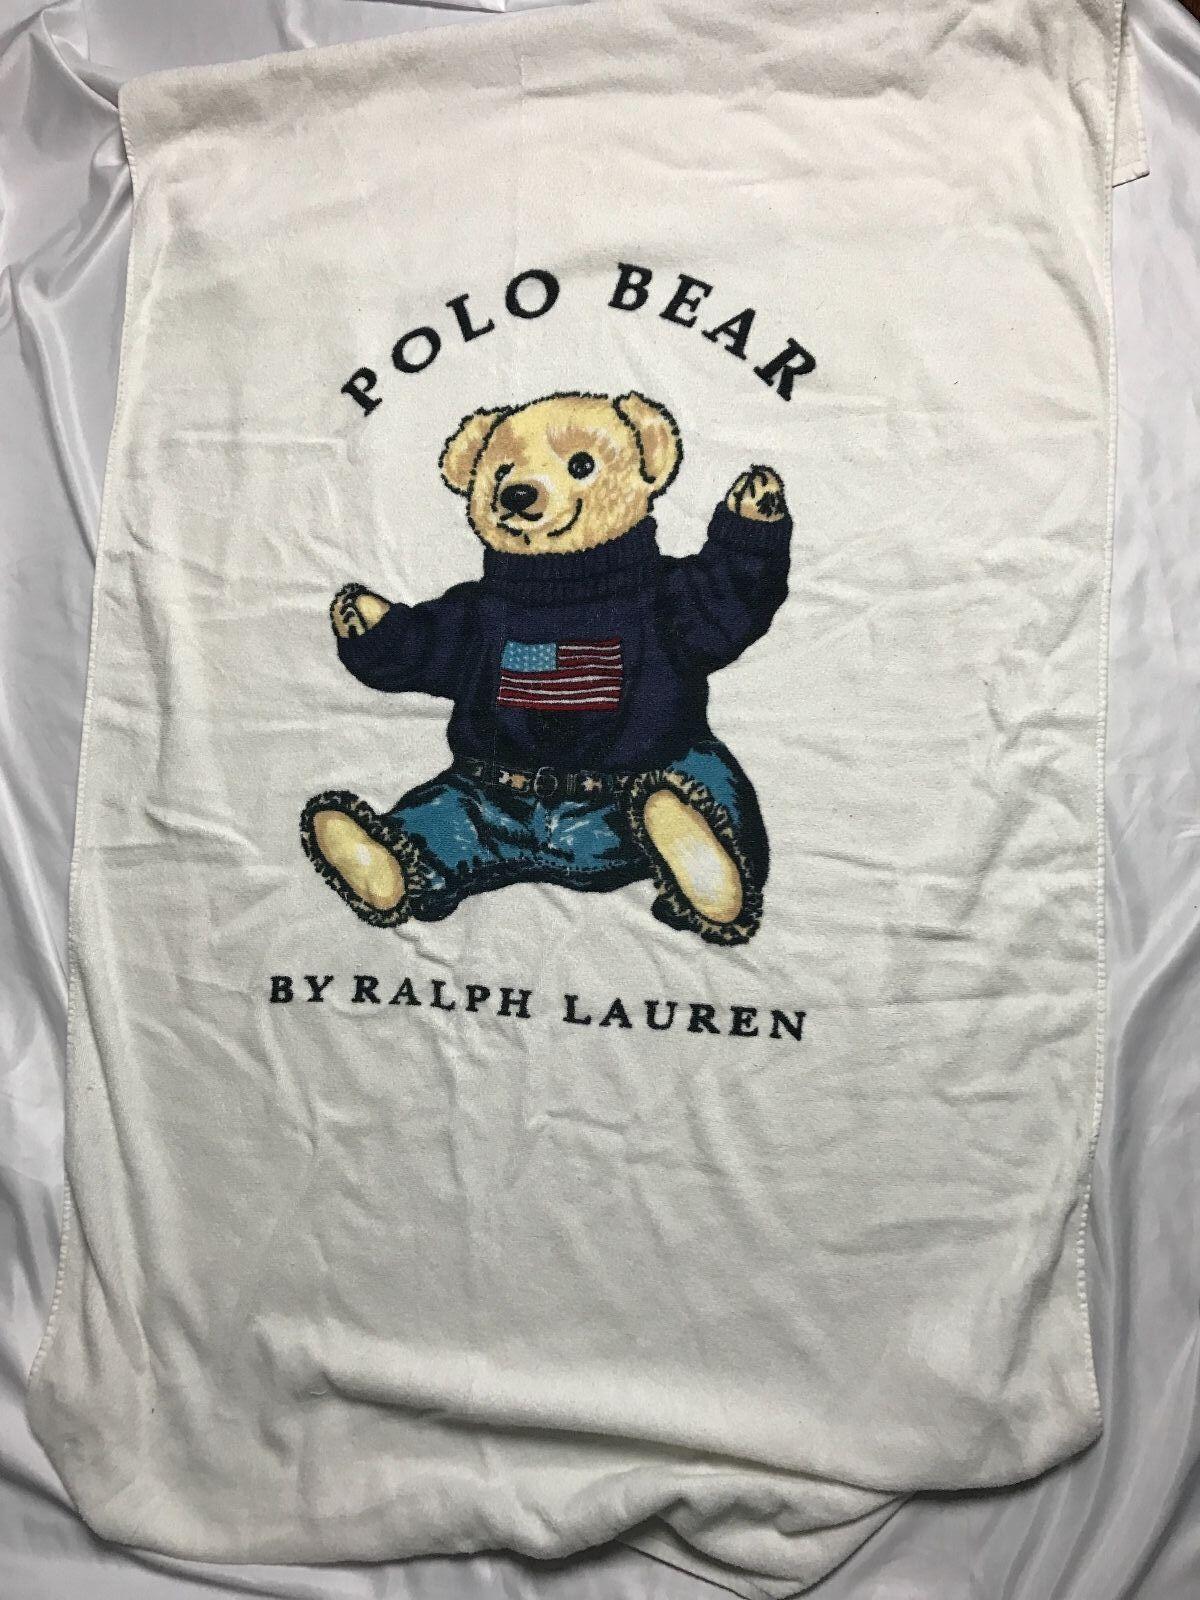 Vintage Polo Bear Towel 90s Sit Down Bear